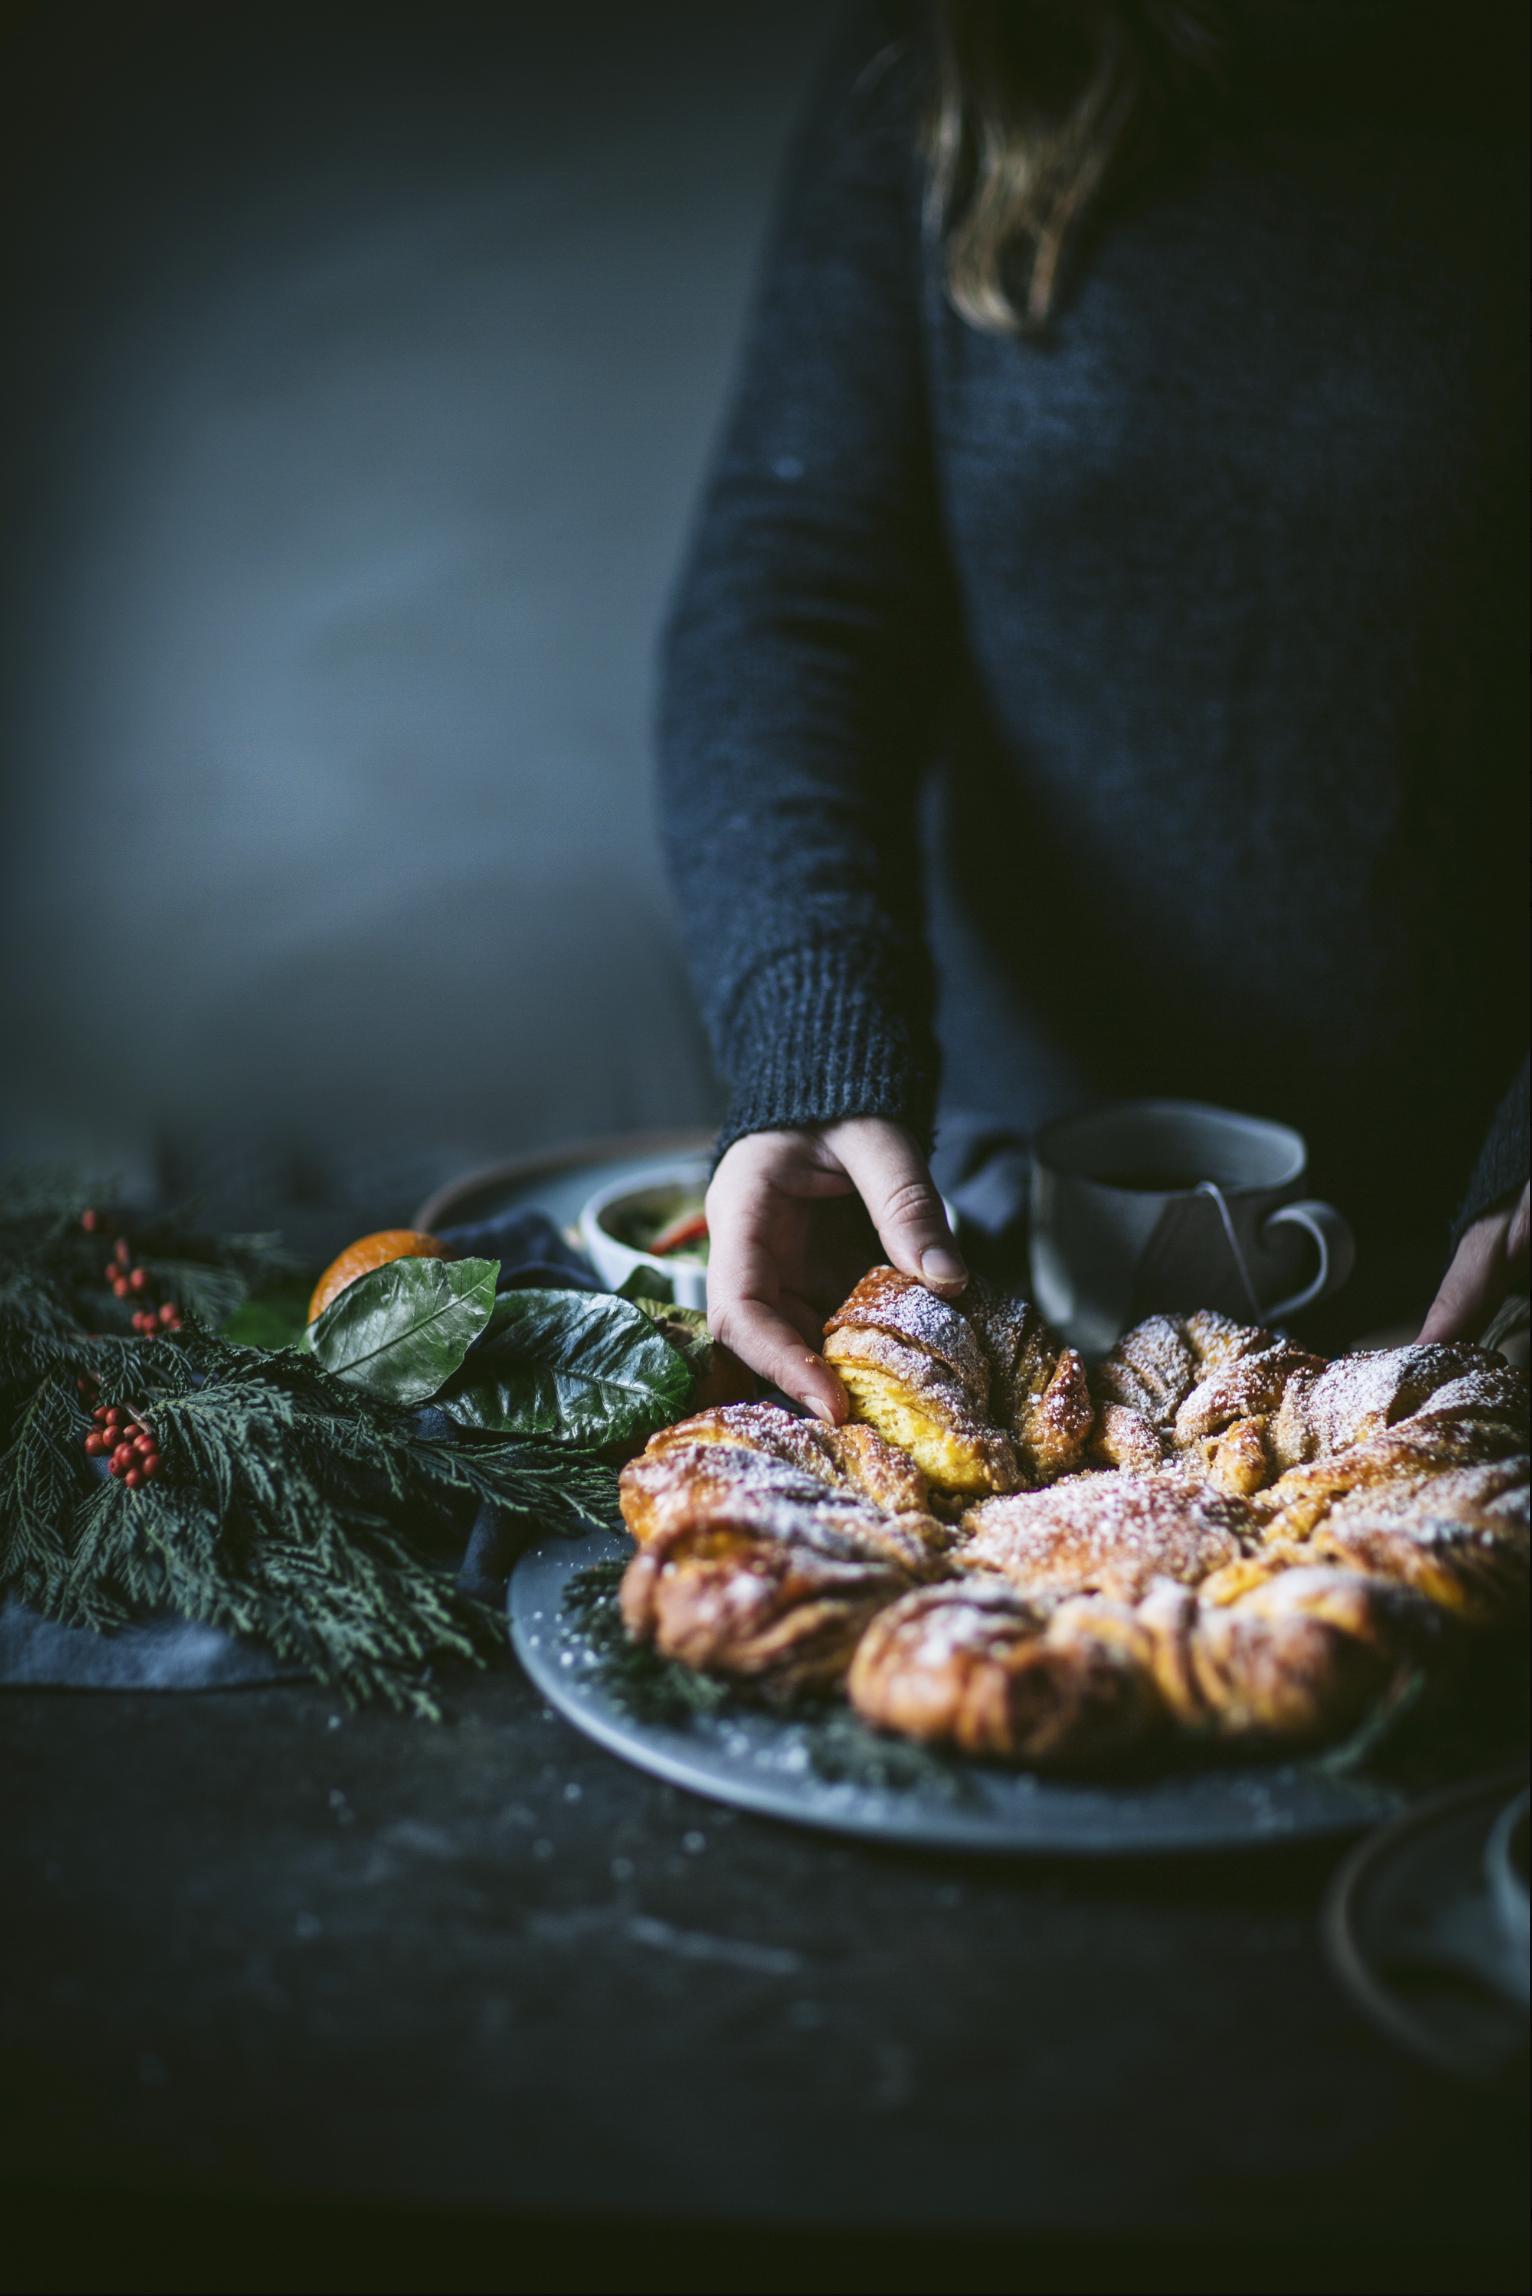 The Best Food Photography Lightroom Presets